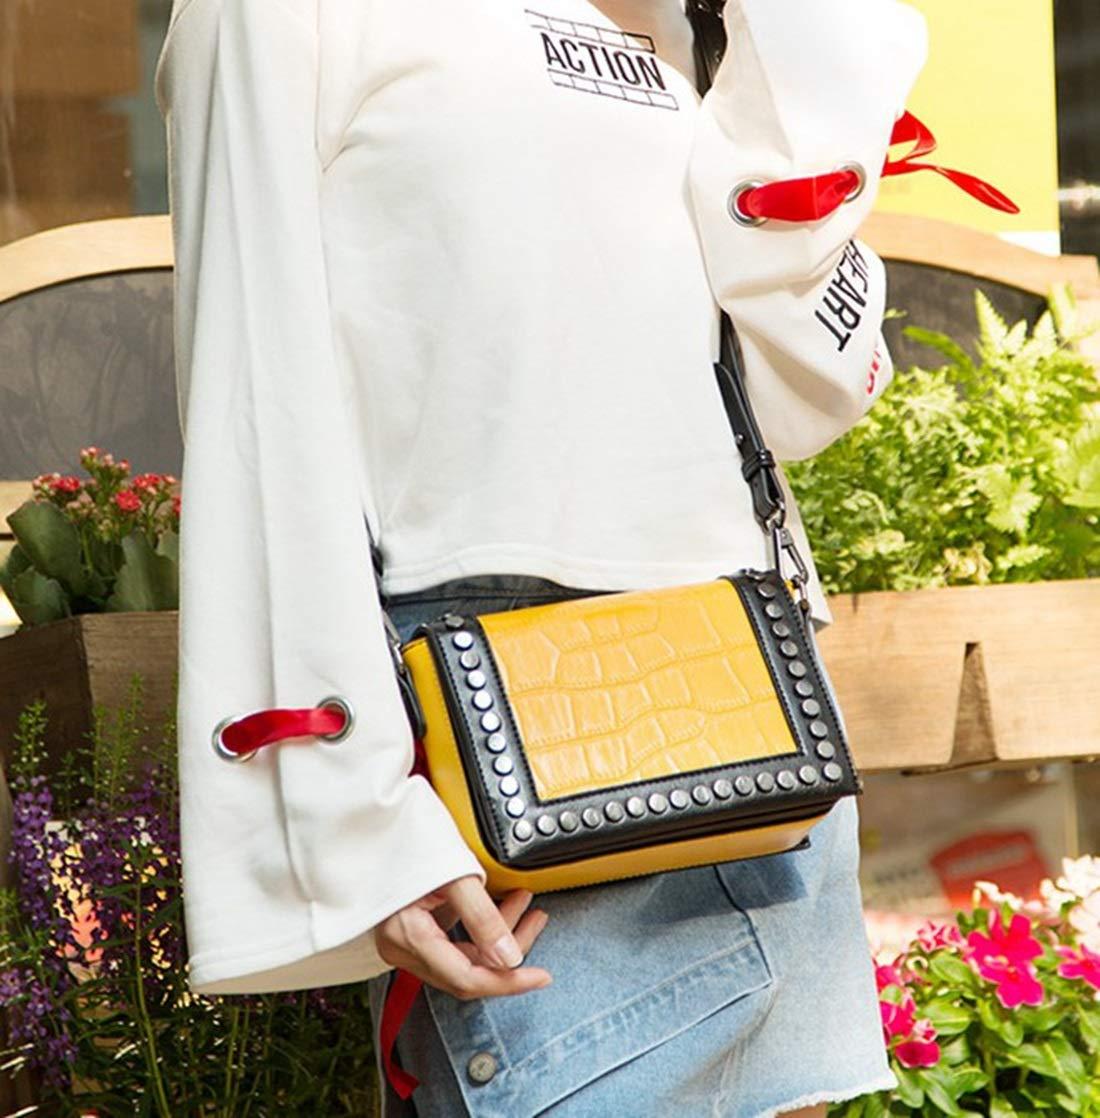 Color : Red Carriemeow Casual Liu Ding Small Square Bag Wide Shoulder Strap Shoulder Messenger Bag